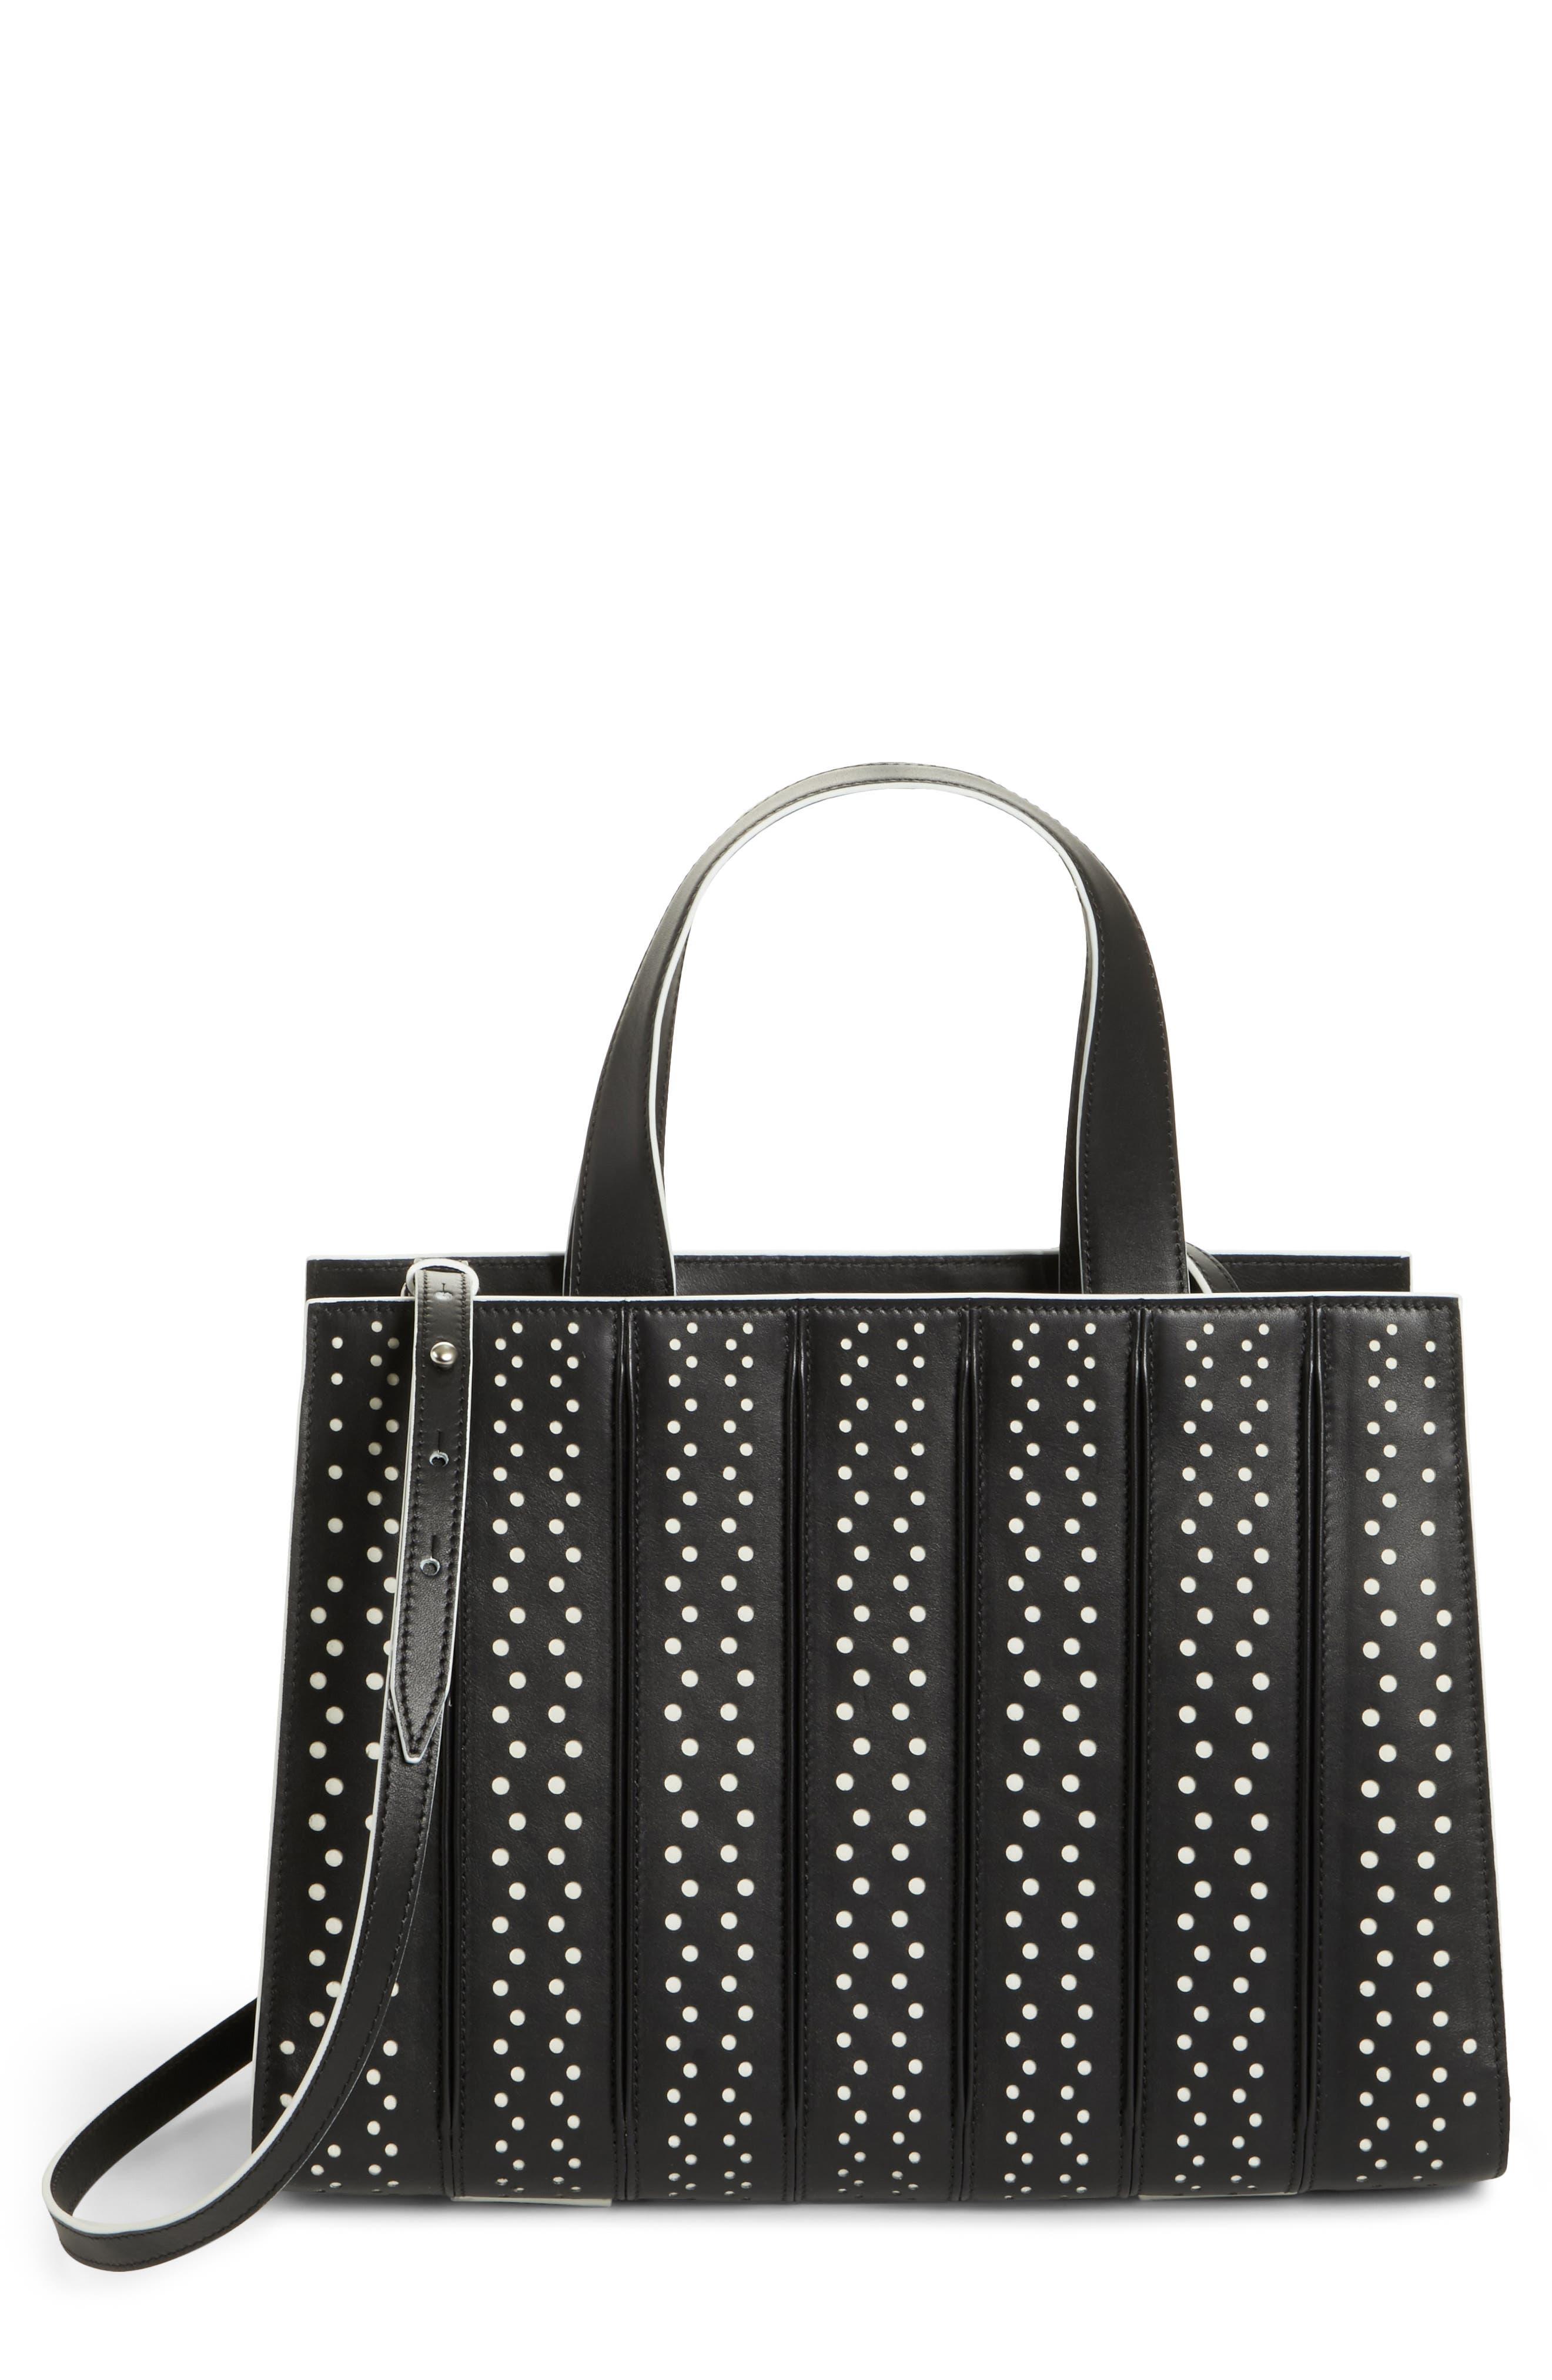 Medium Whitney Polka Dot Leather Tote,                         Main,                         color, Black/ White